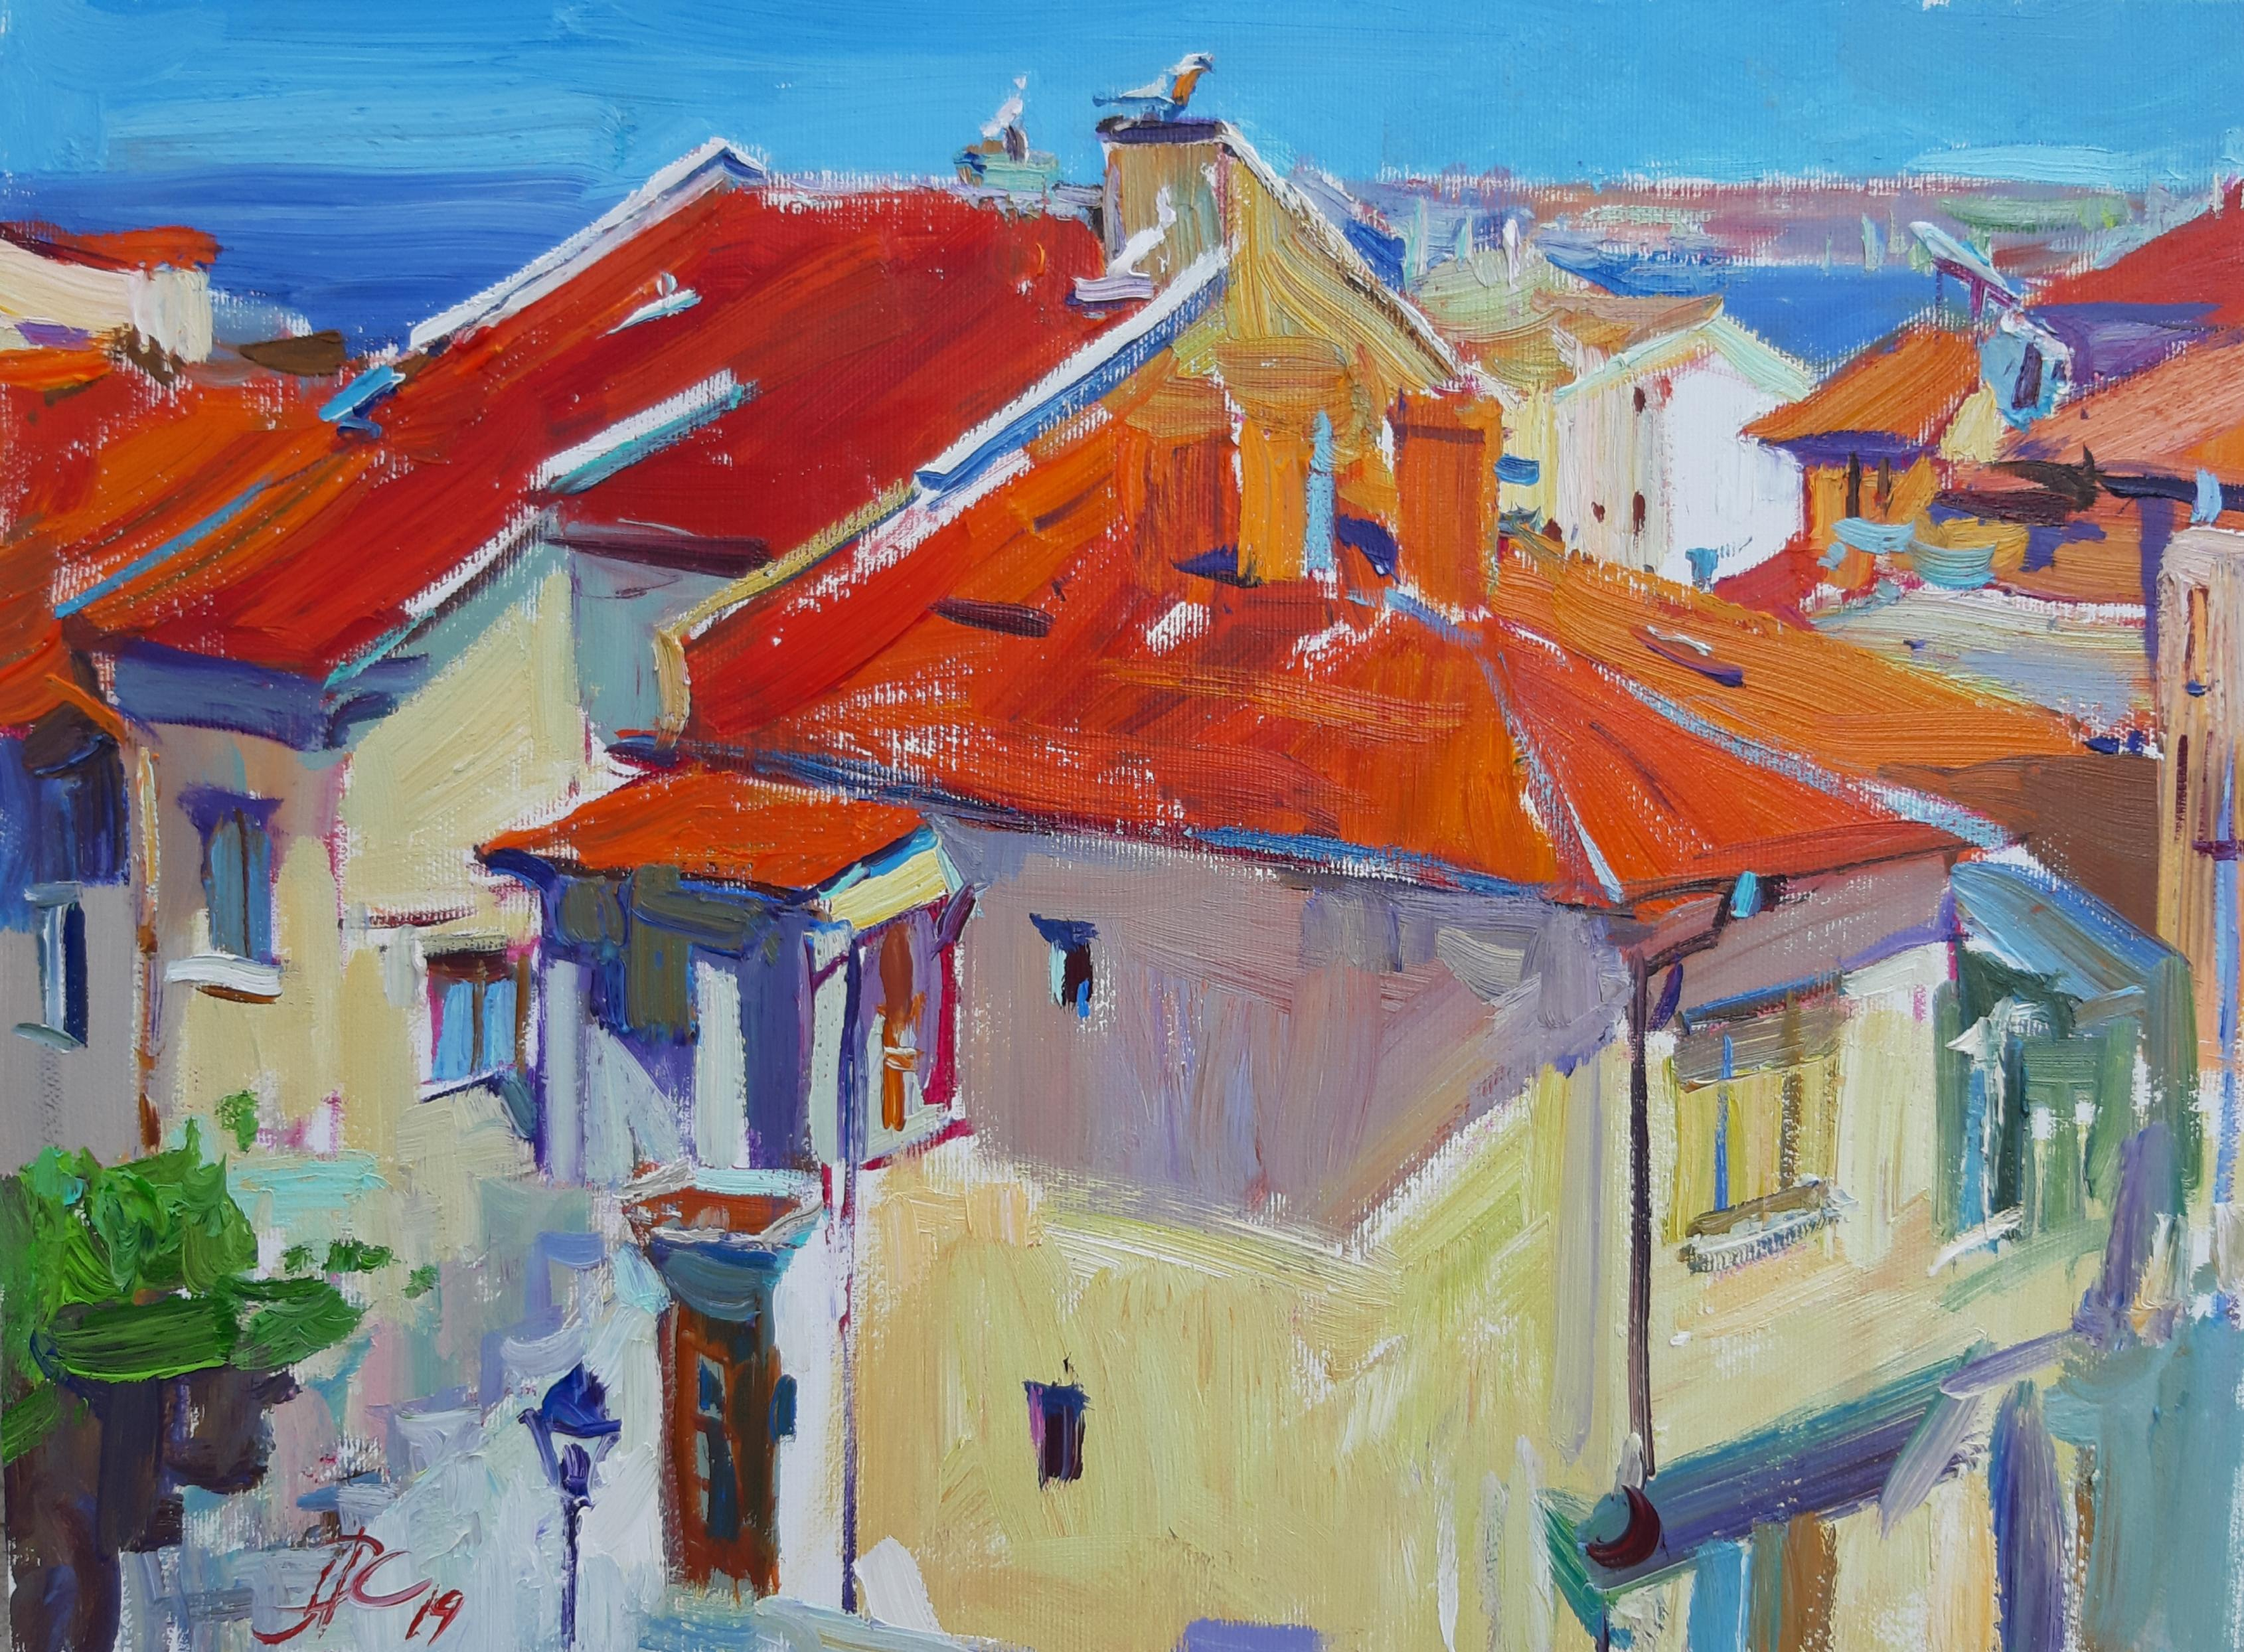 Sozopol's Roofs